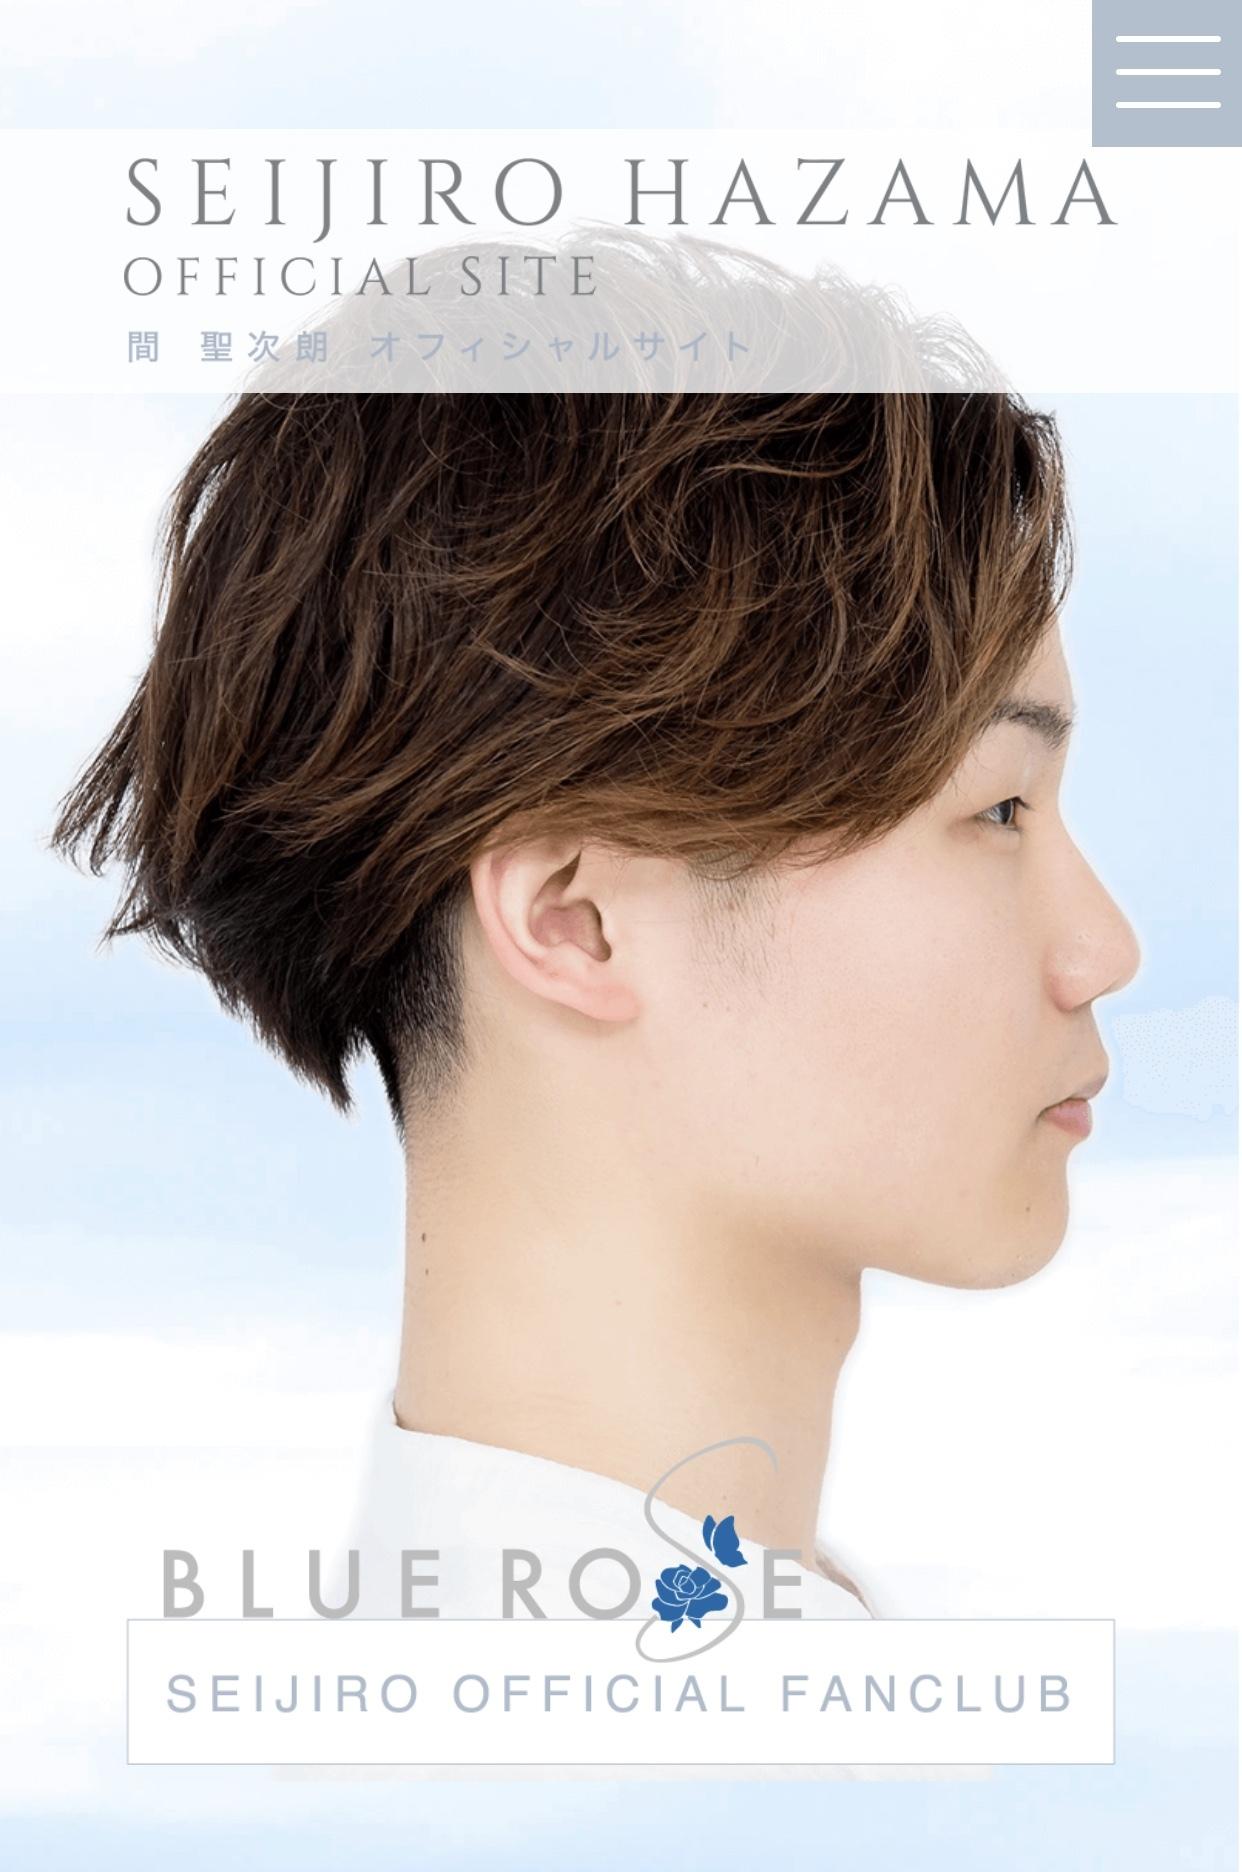 Seijiroオフィシャルファンクラブ「BLUE ROSE」設立記念 オープニングキャンペーン実施中です♡_a0157409_06503349.jpeg